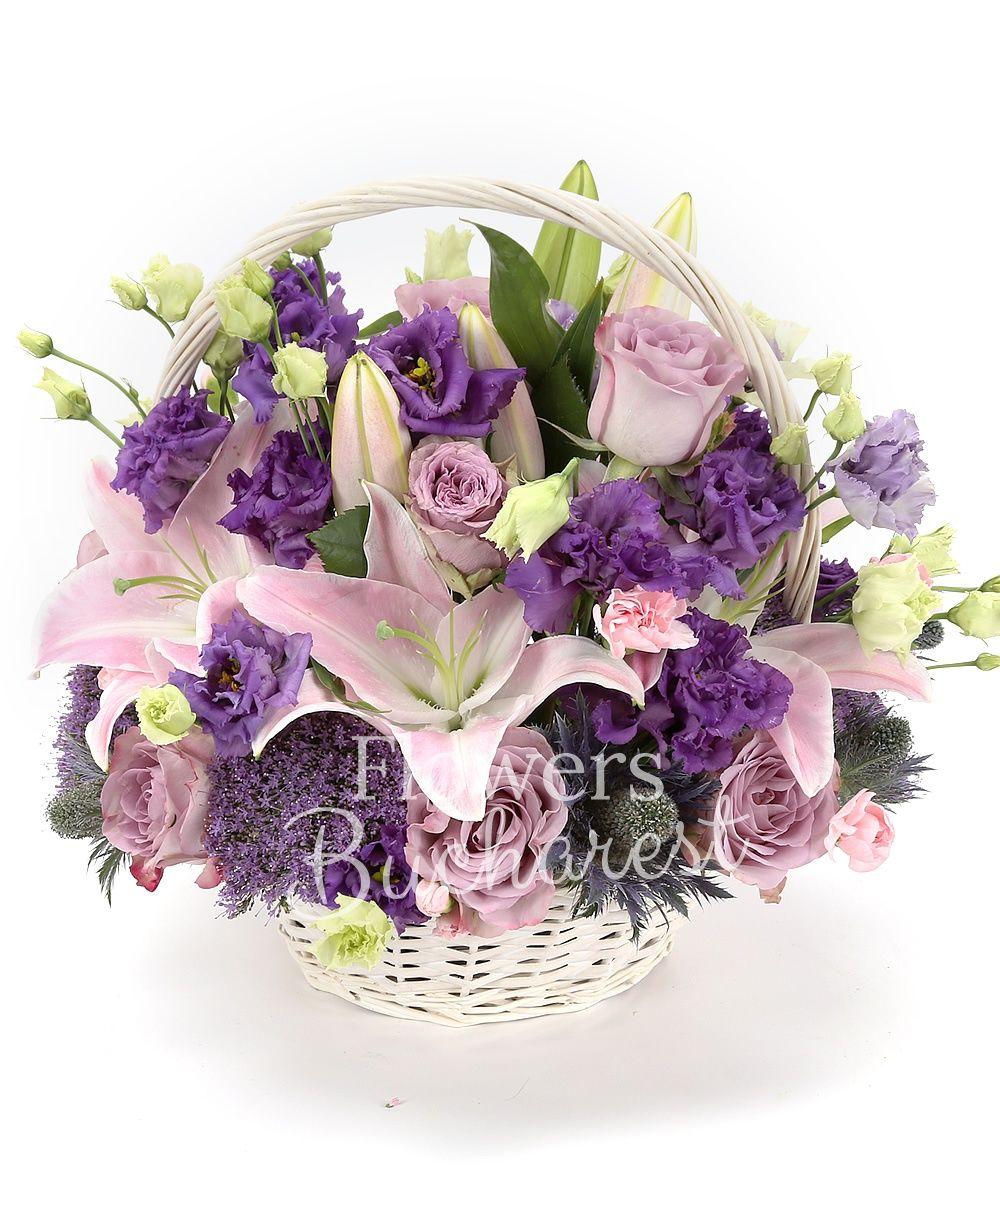 10 purple roses, 3 pink lilies, 5 purple lisianthus, 3 purple trachelium, 3 eryngium, 5 pink carnations